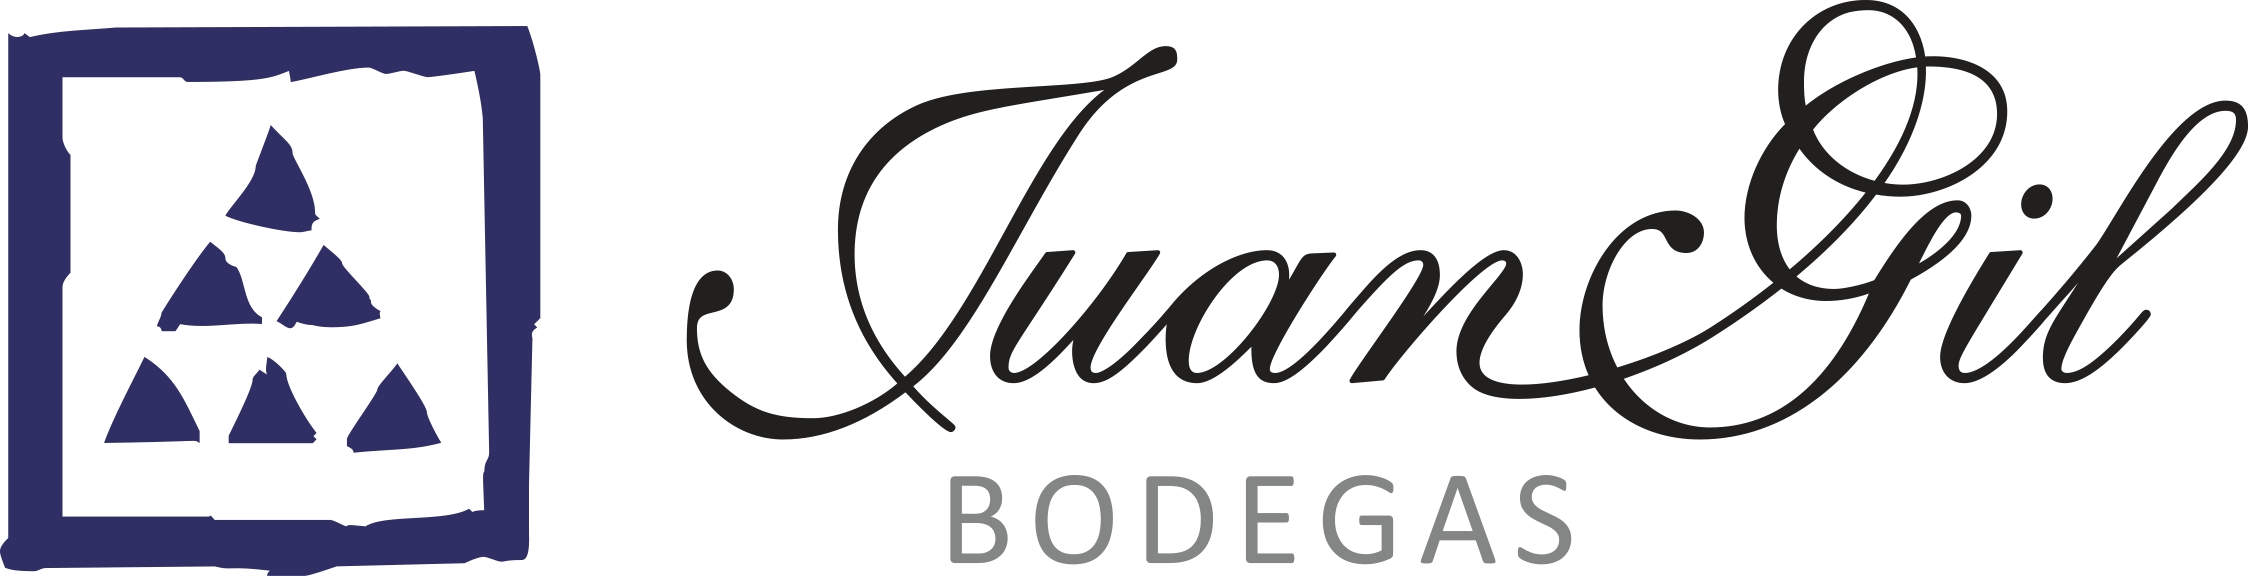 Bodegas Juan Gil logo_wineaffair